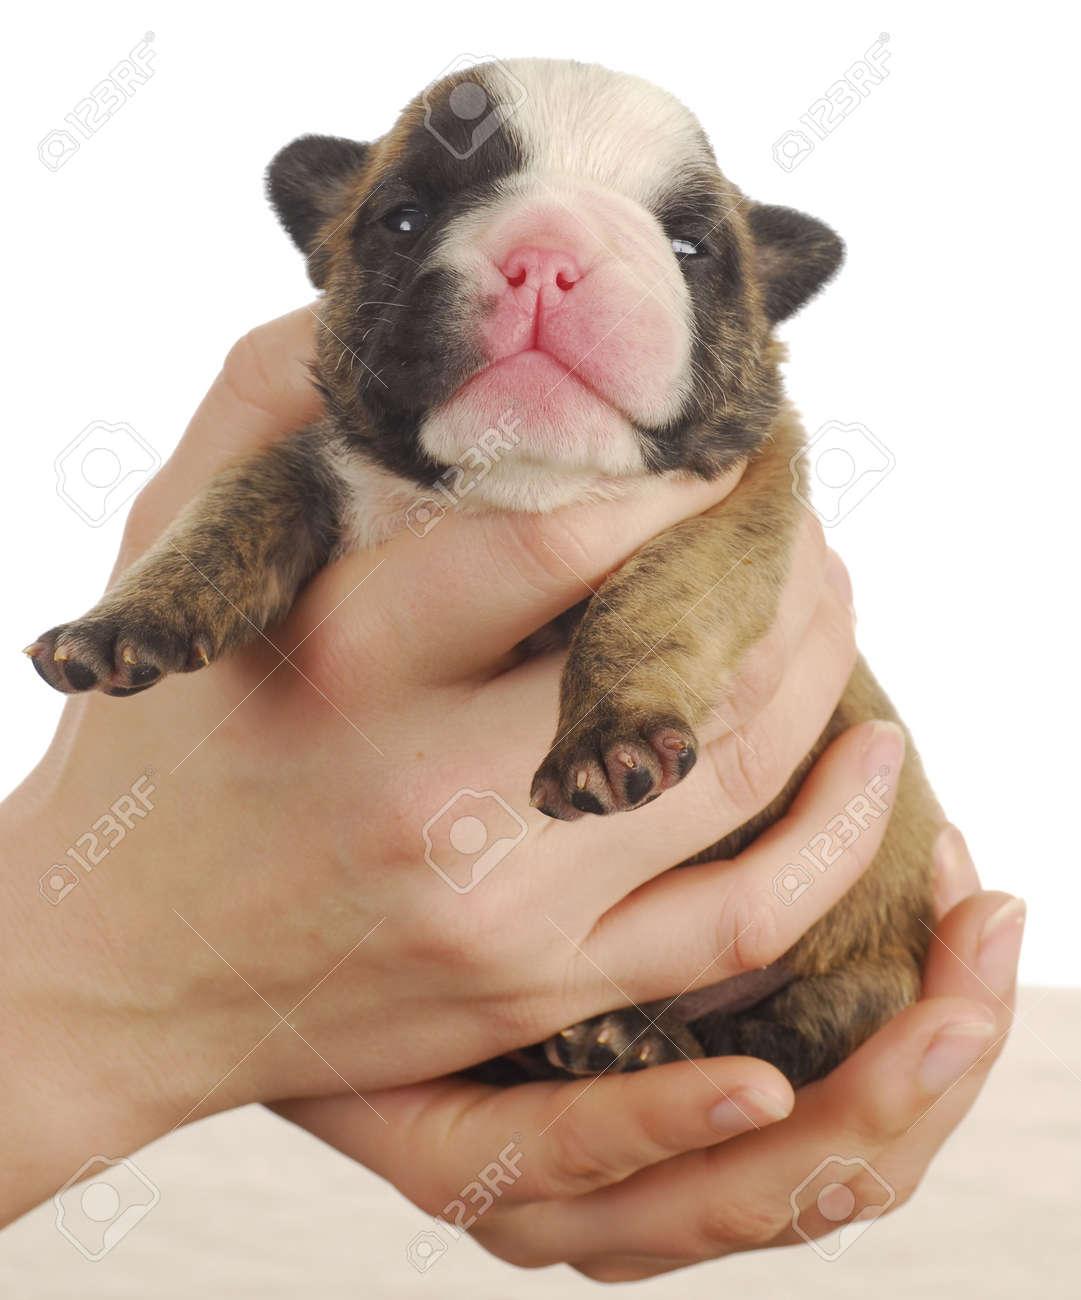 Newborn Puppy English Bulldog Puppy 2 Weeks Old Stock Photo